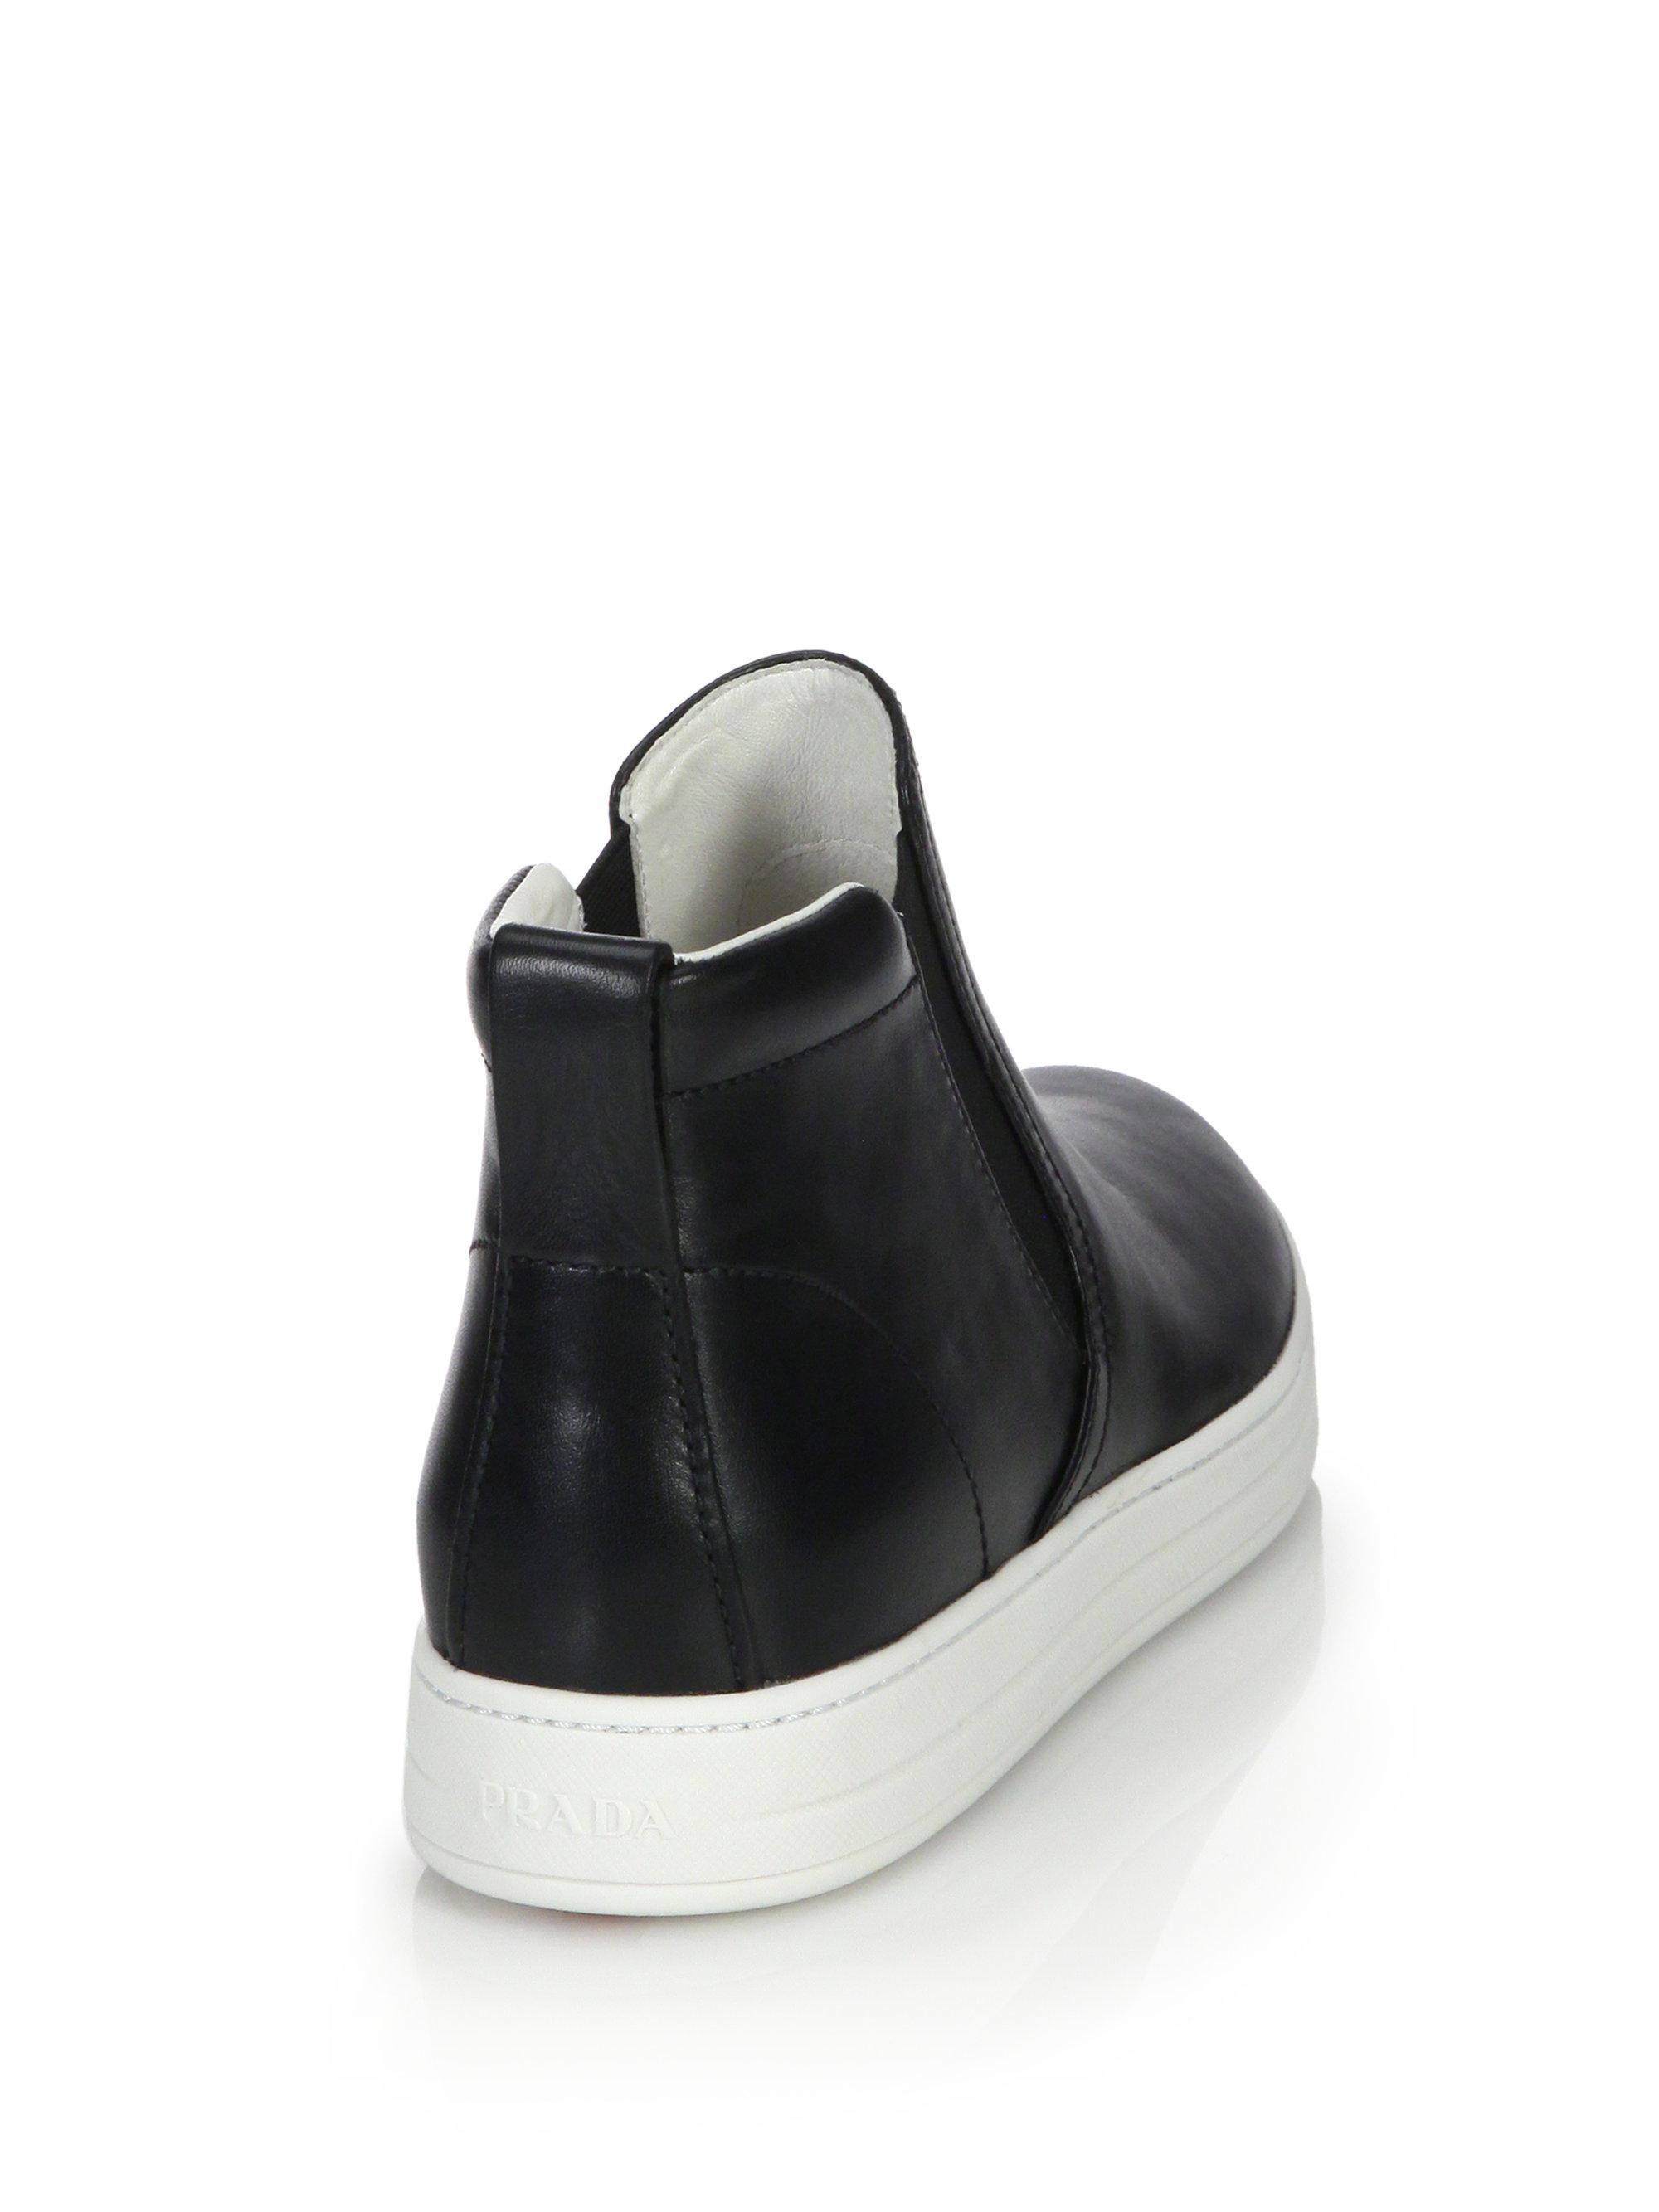 buy prada handbag online - Prada High-top Leather Skate Sneakers in Black (black-white) | Lyst